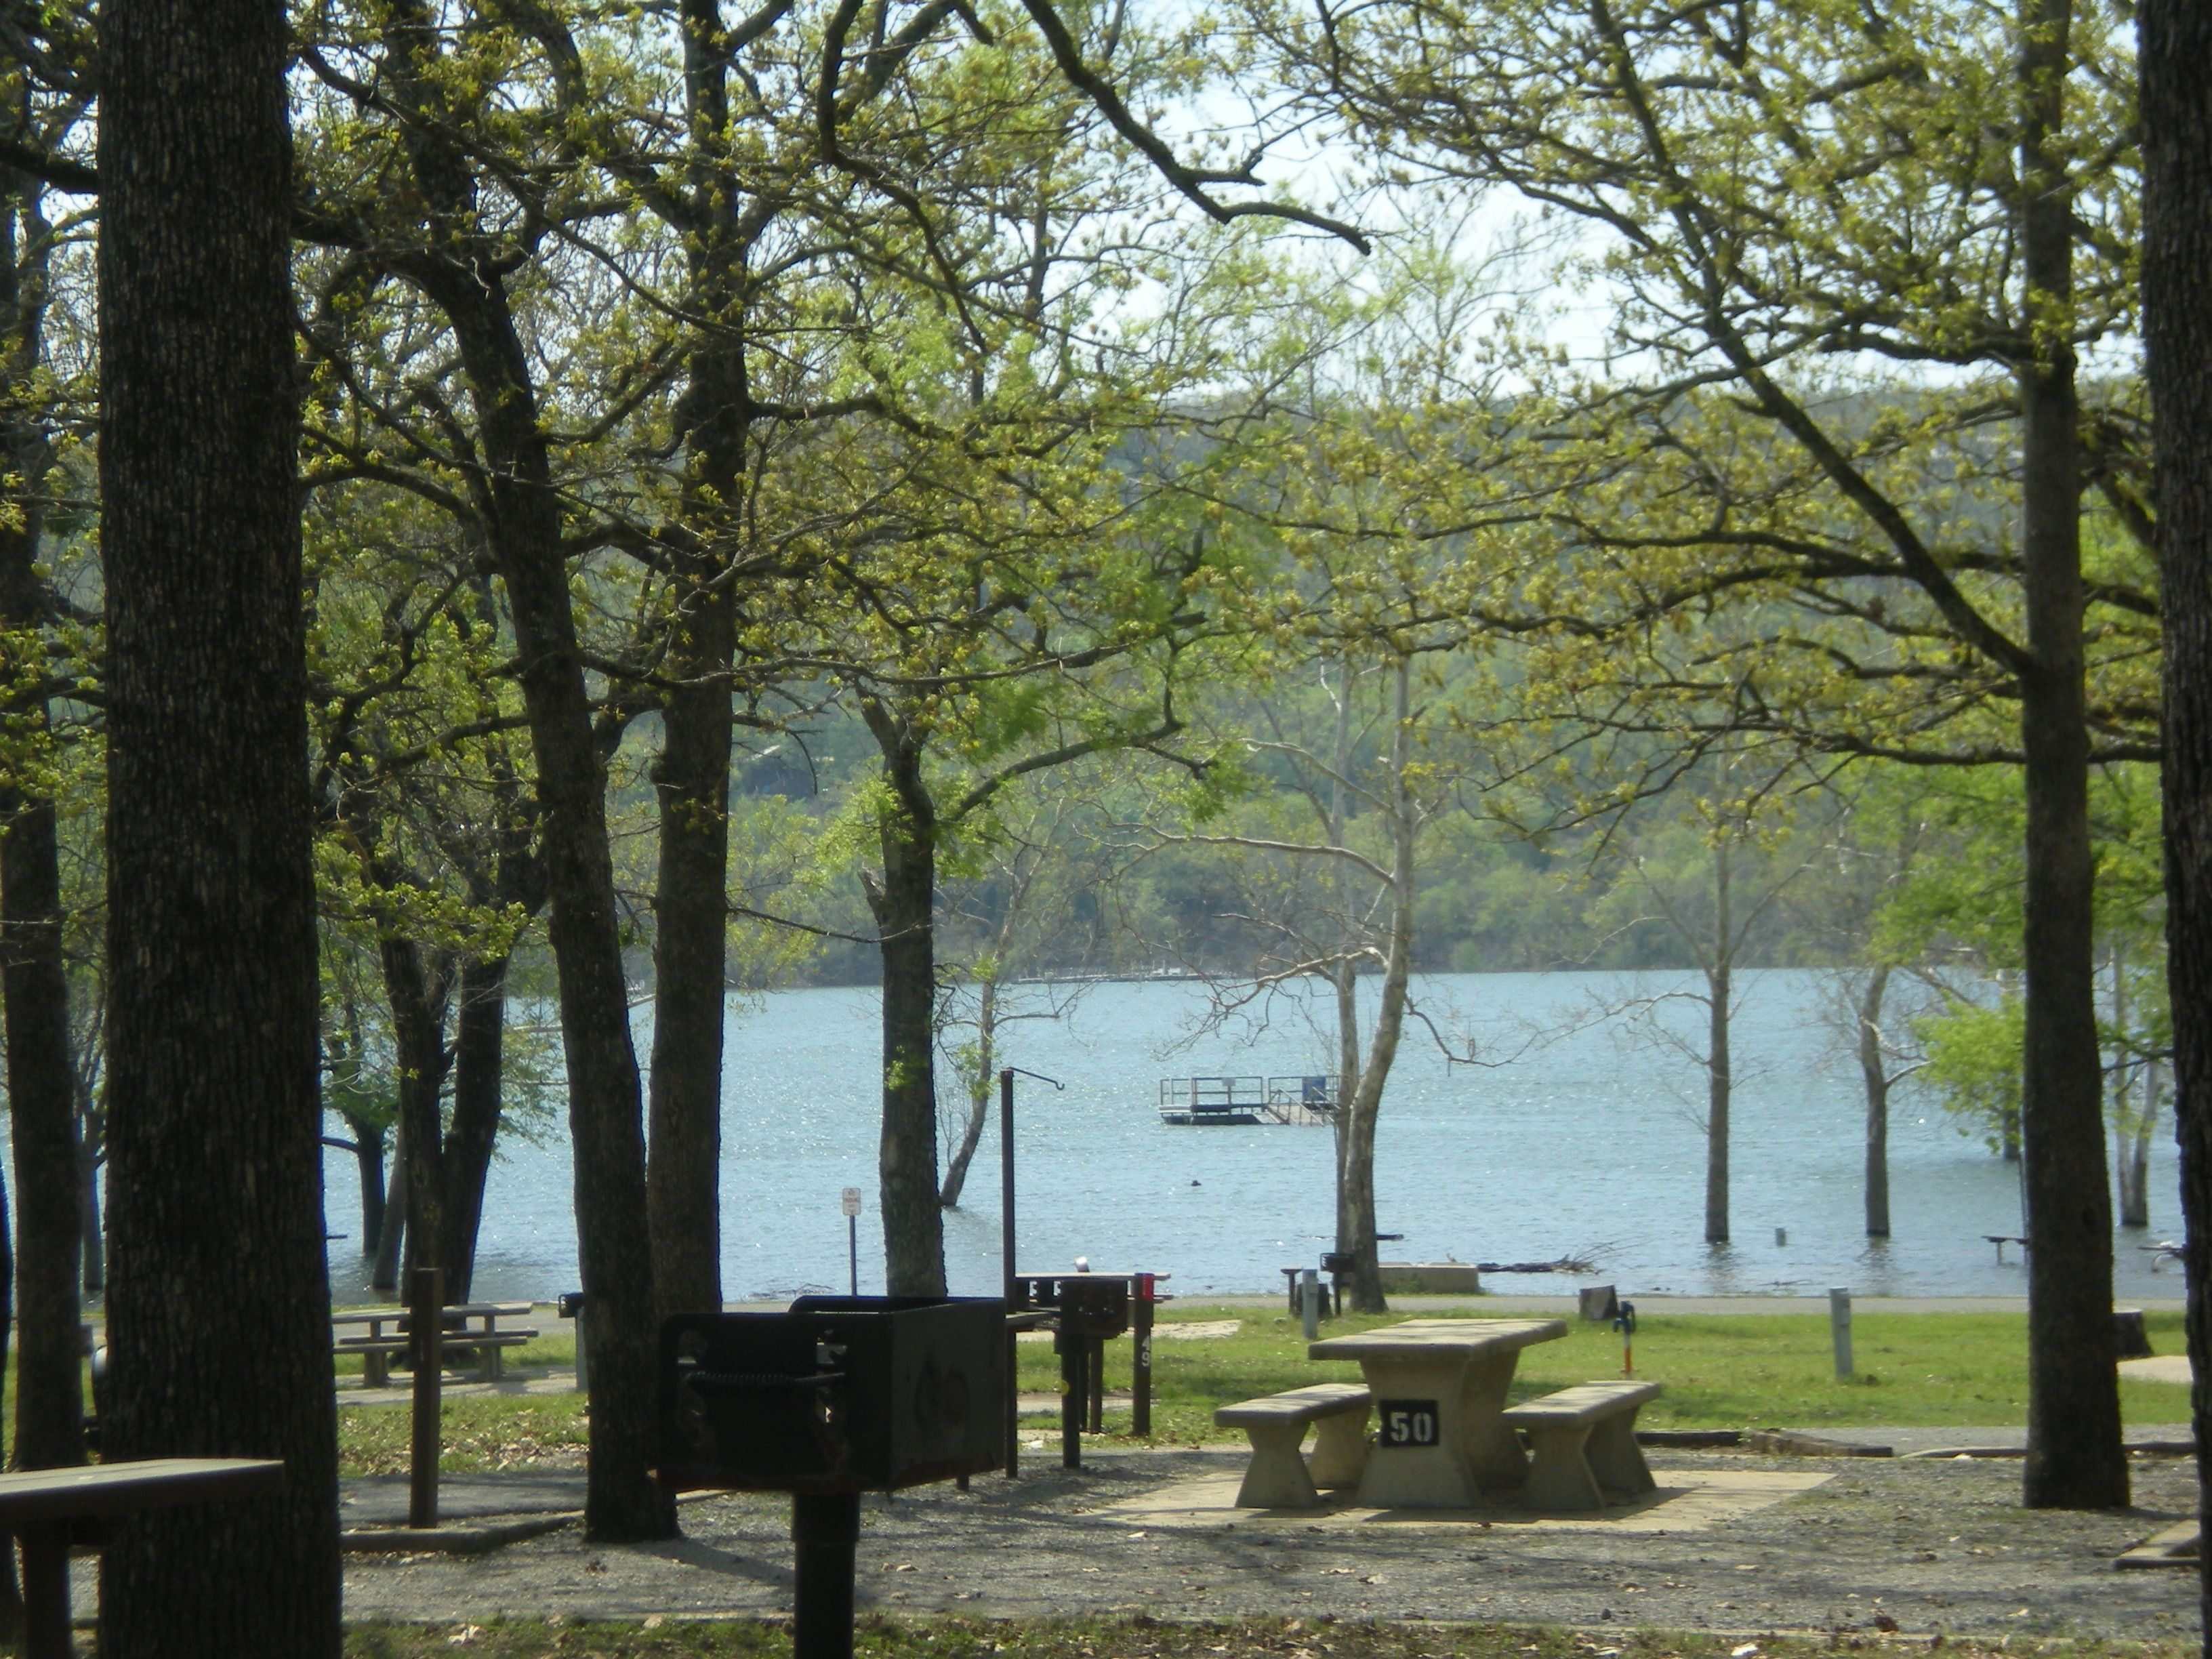 cabins lake tenkiller wister talentneeds park state com